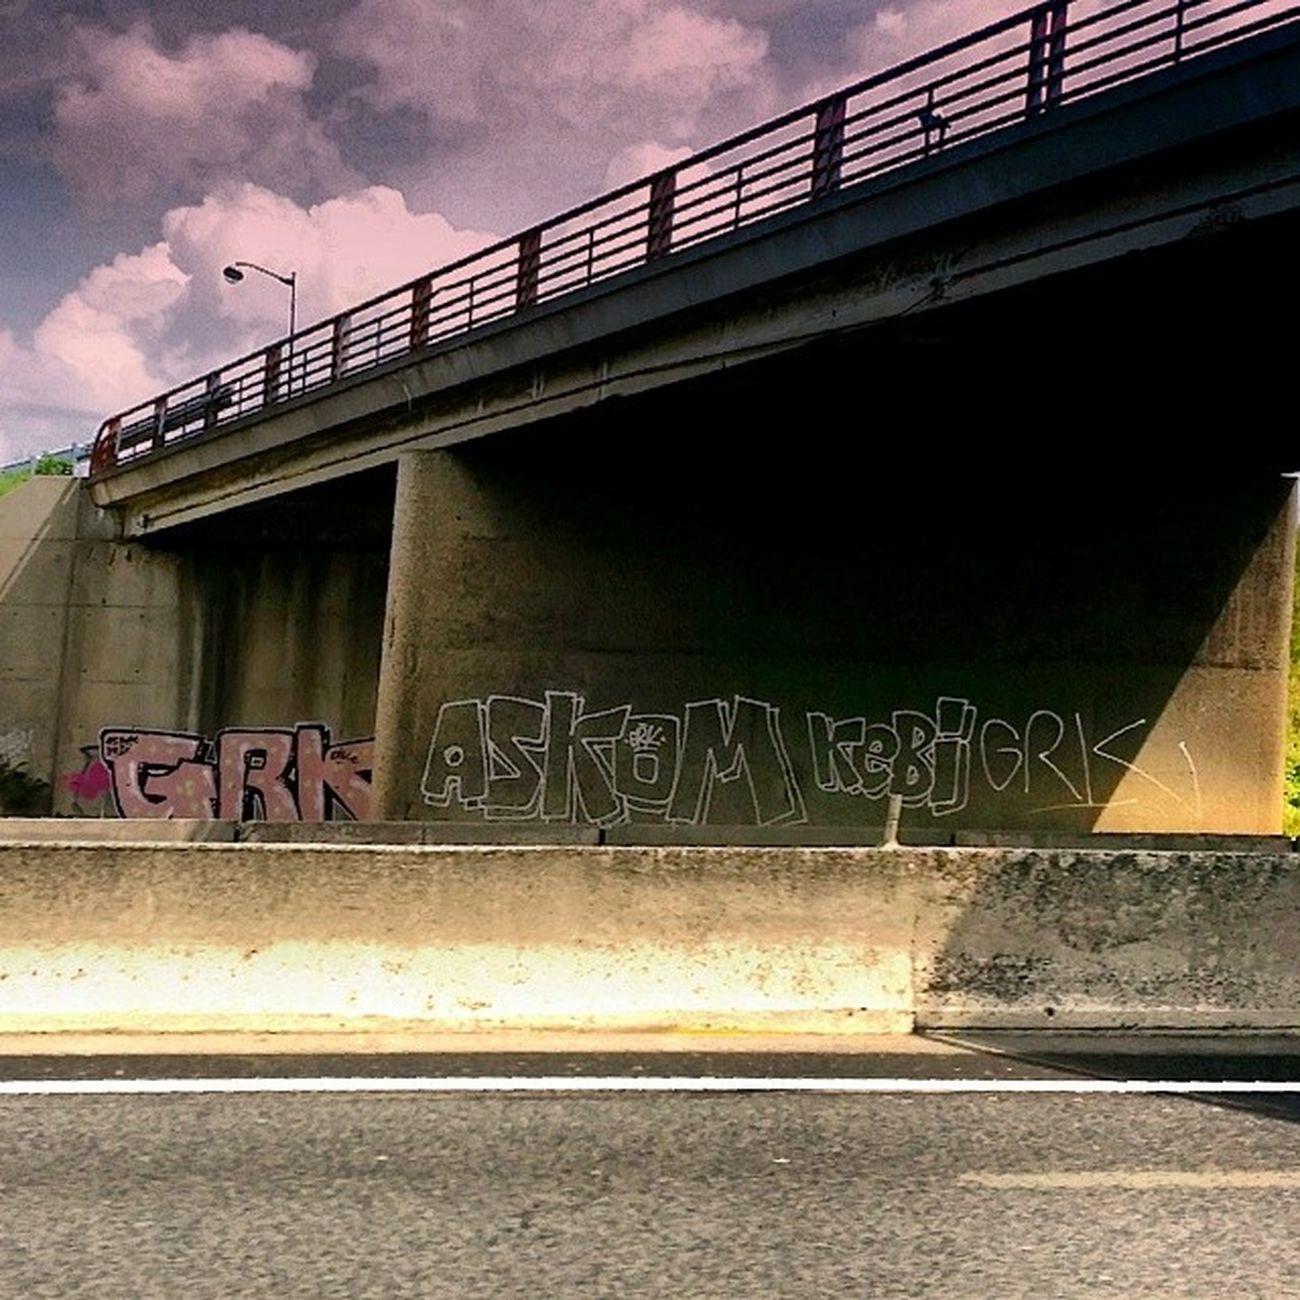 GRK Askom Kebi A6 Streetart Graf Tag